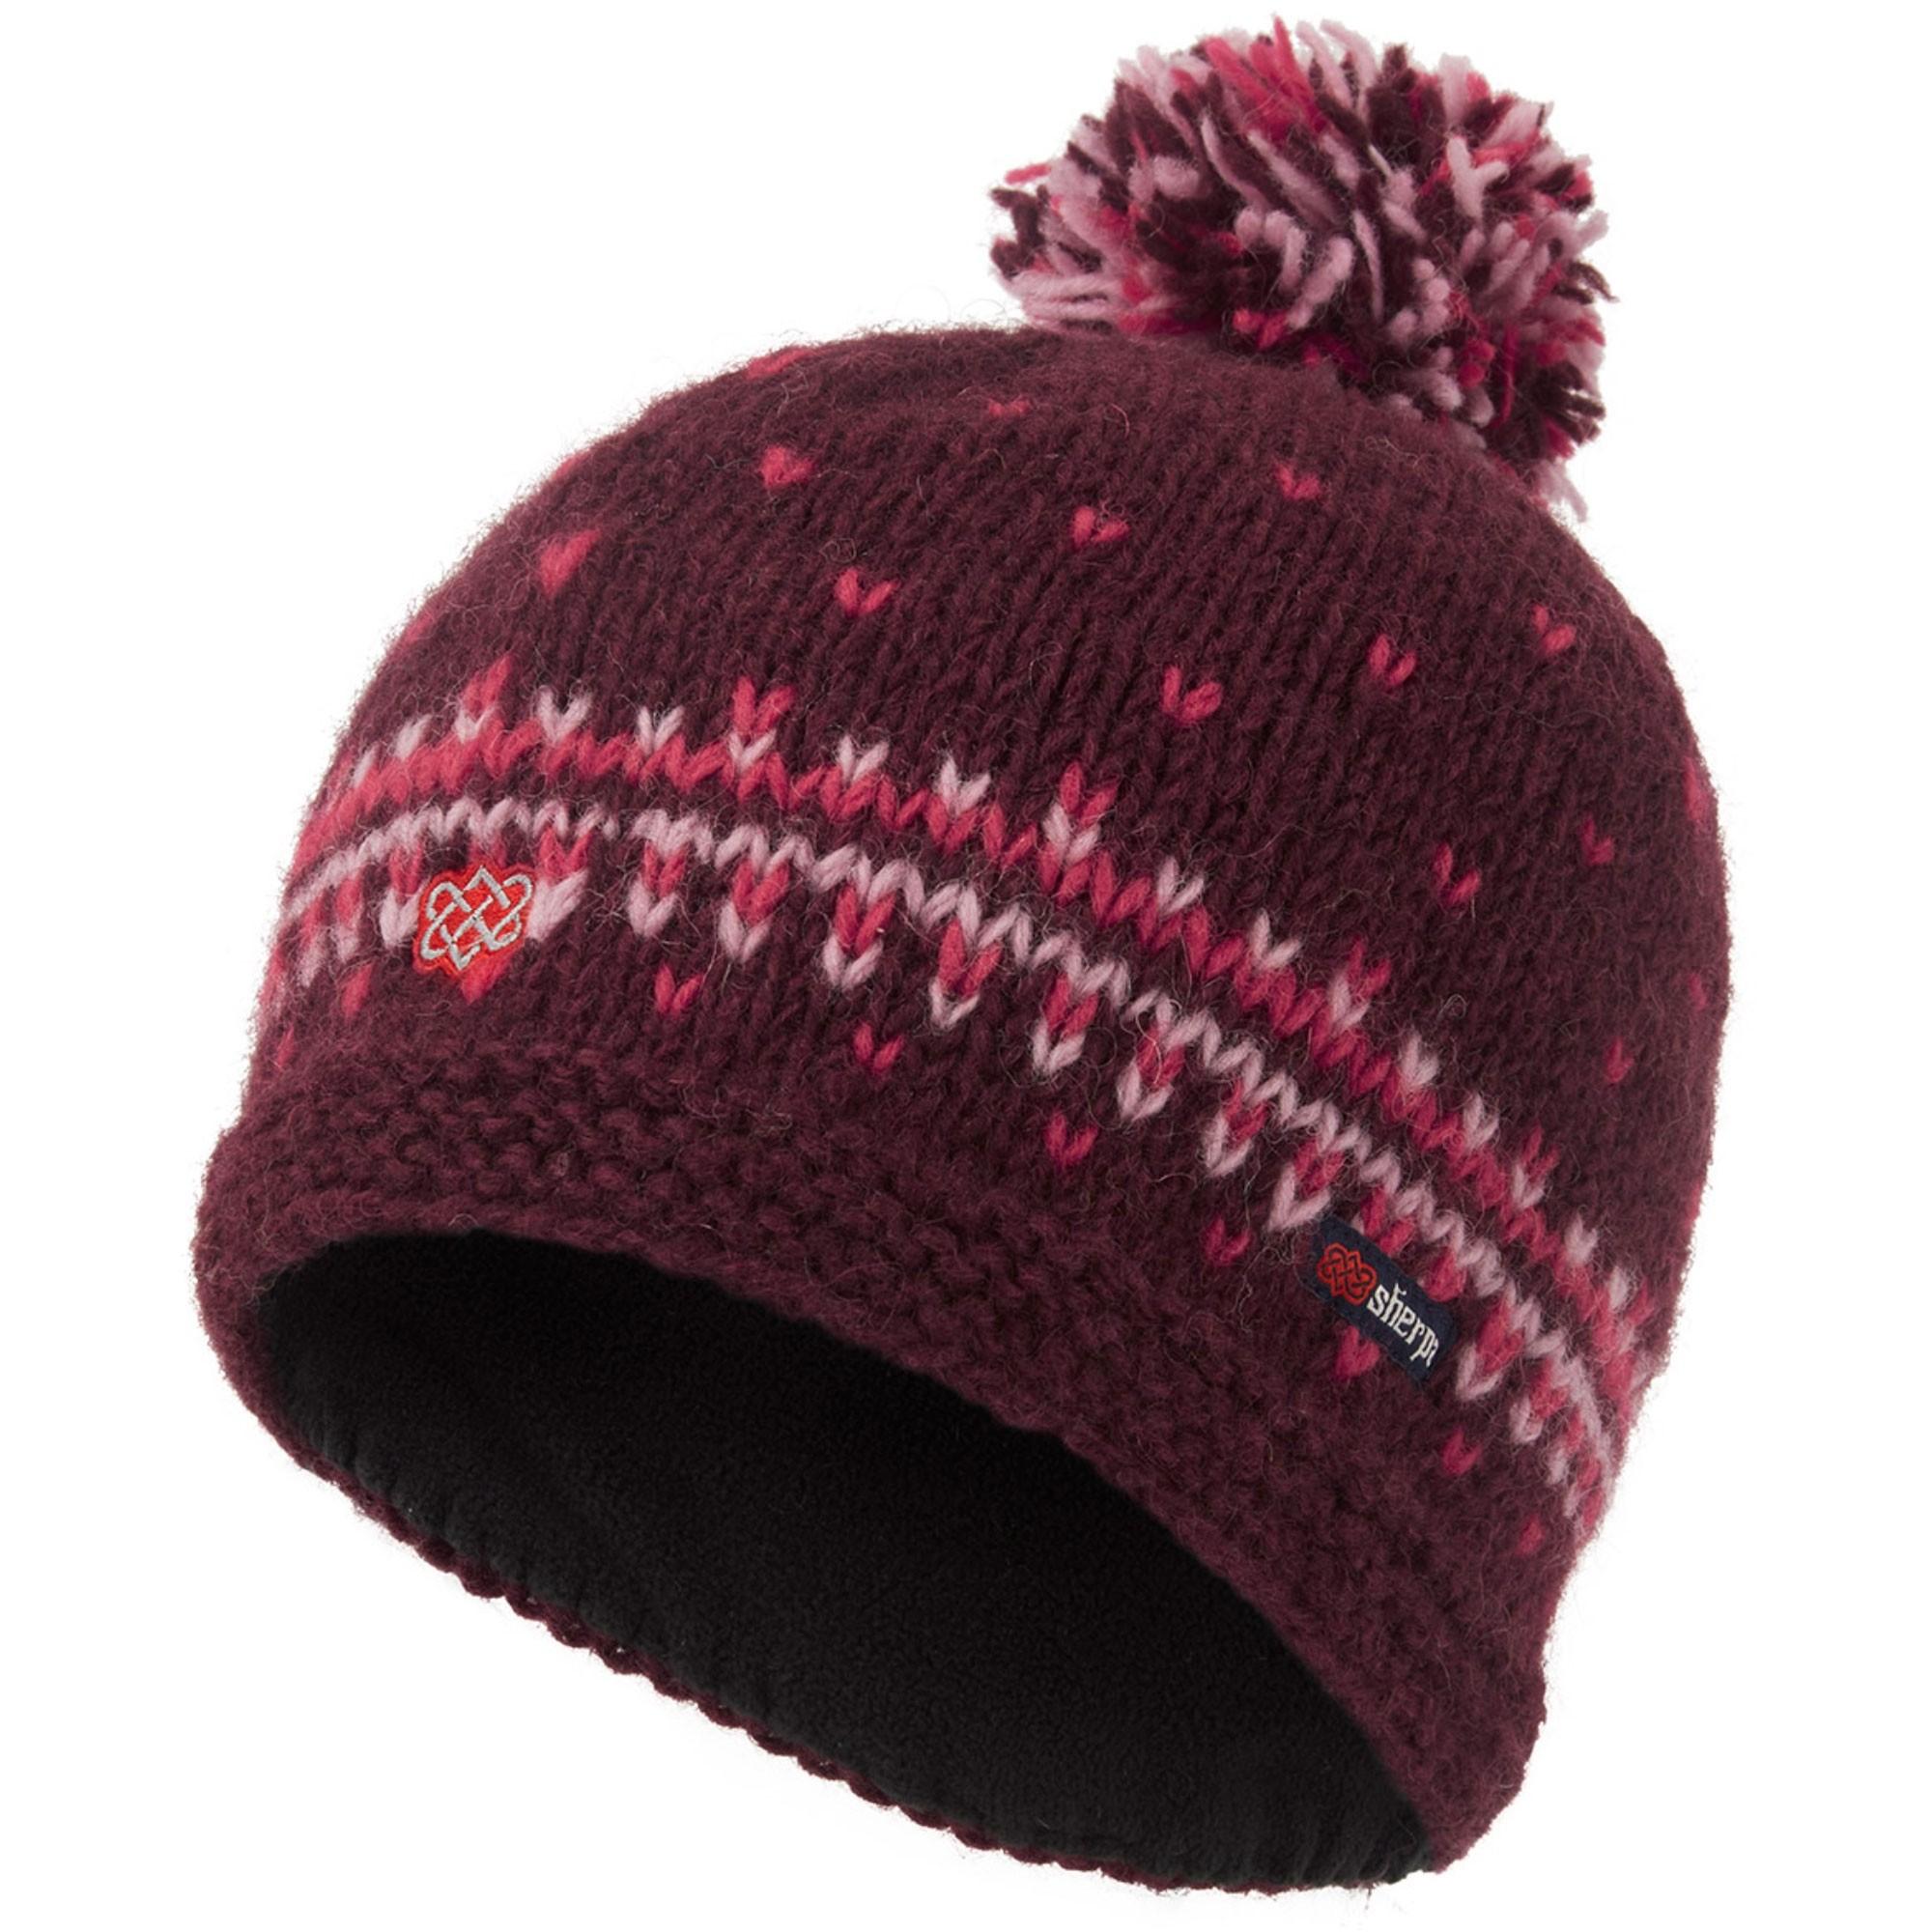 Sherpa Gulmi Hat - Annar